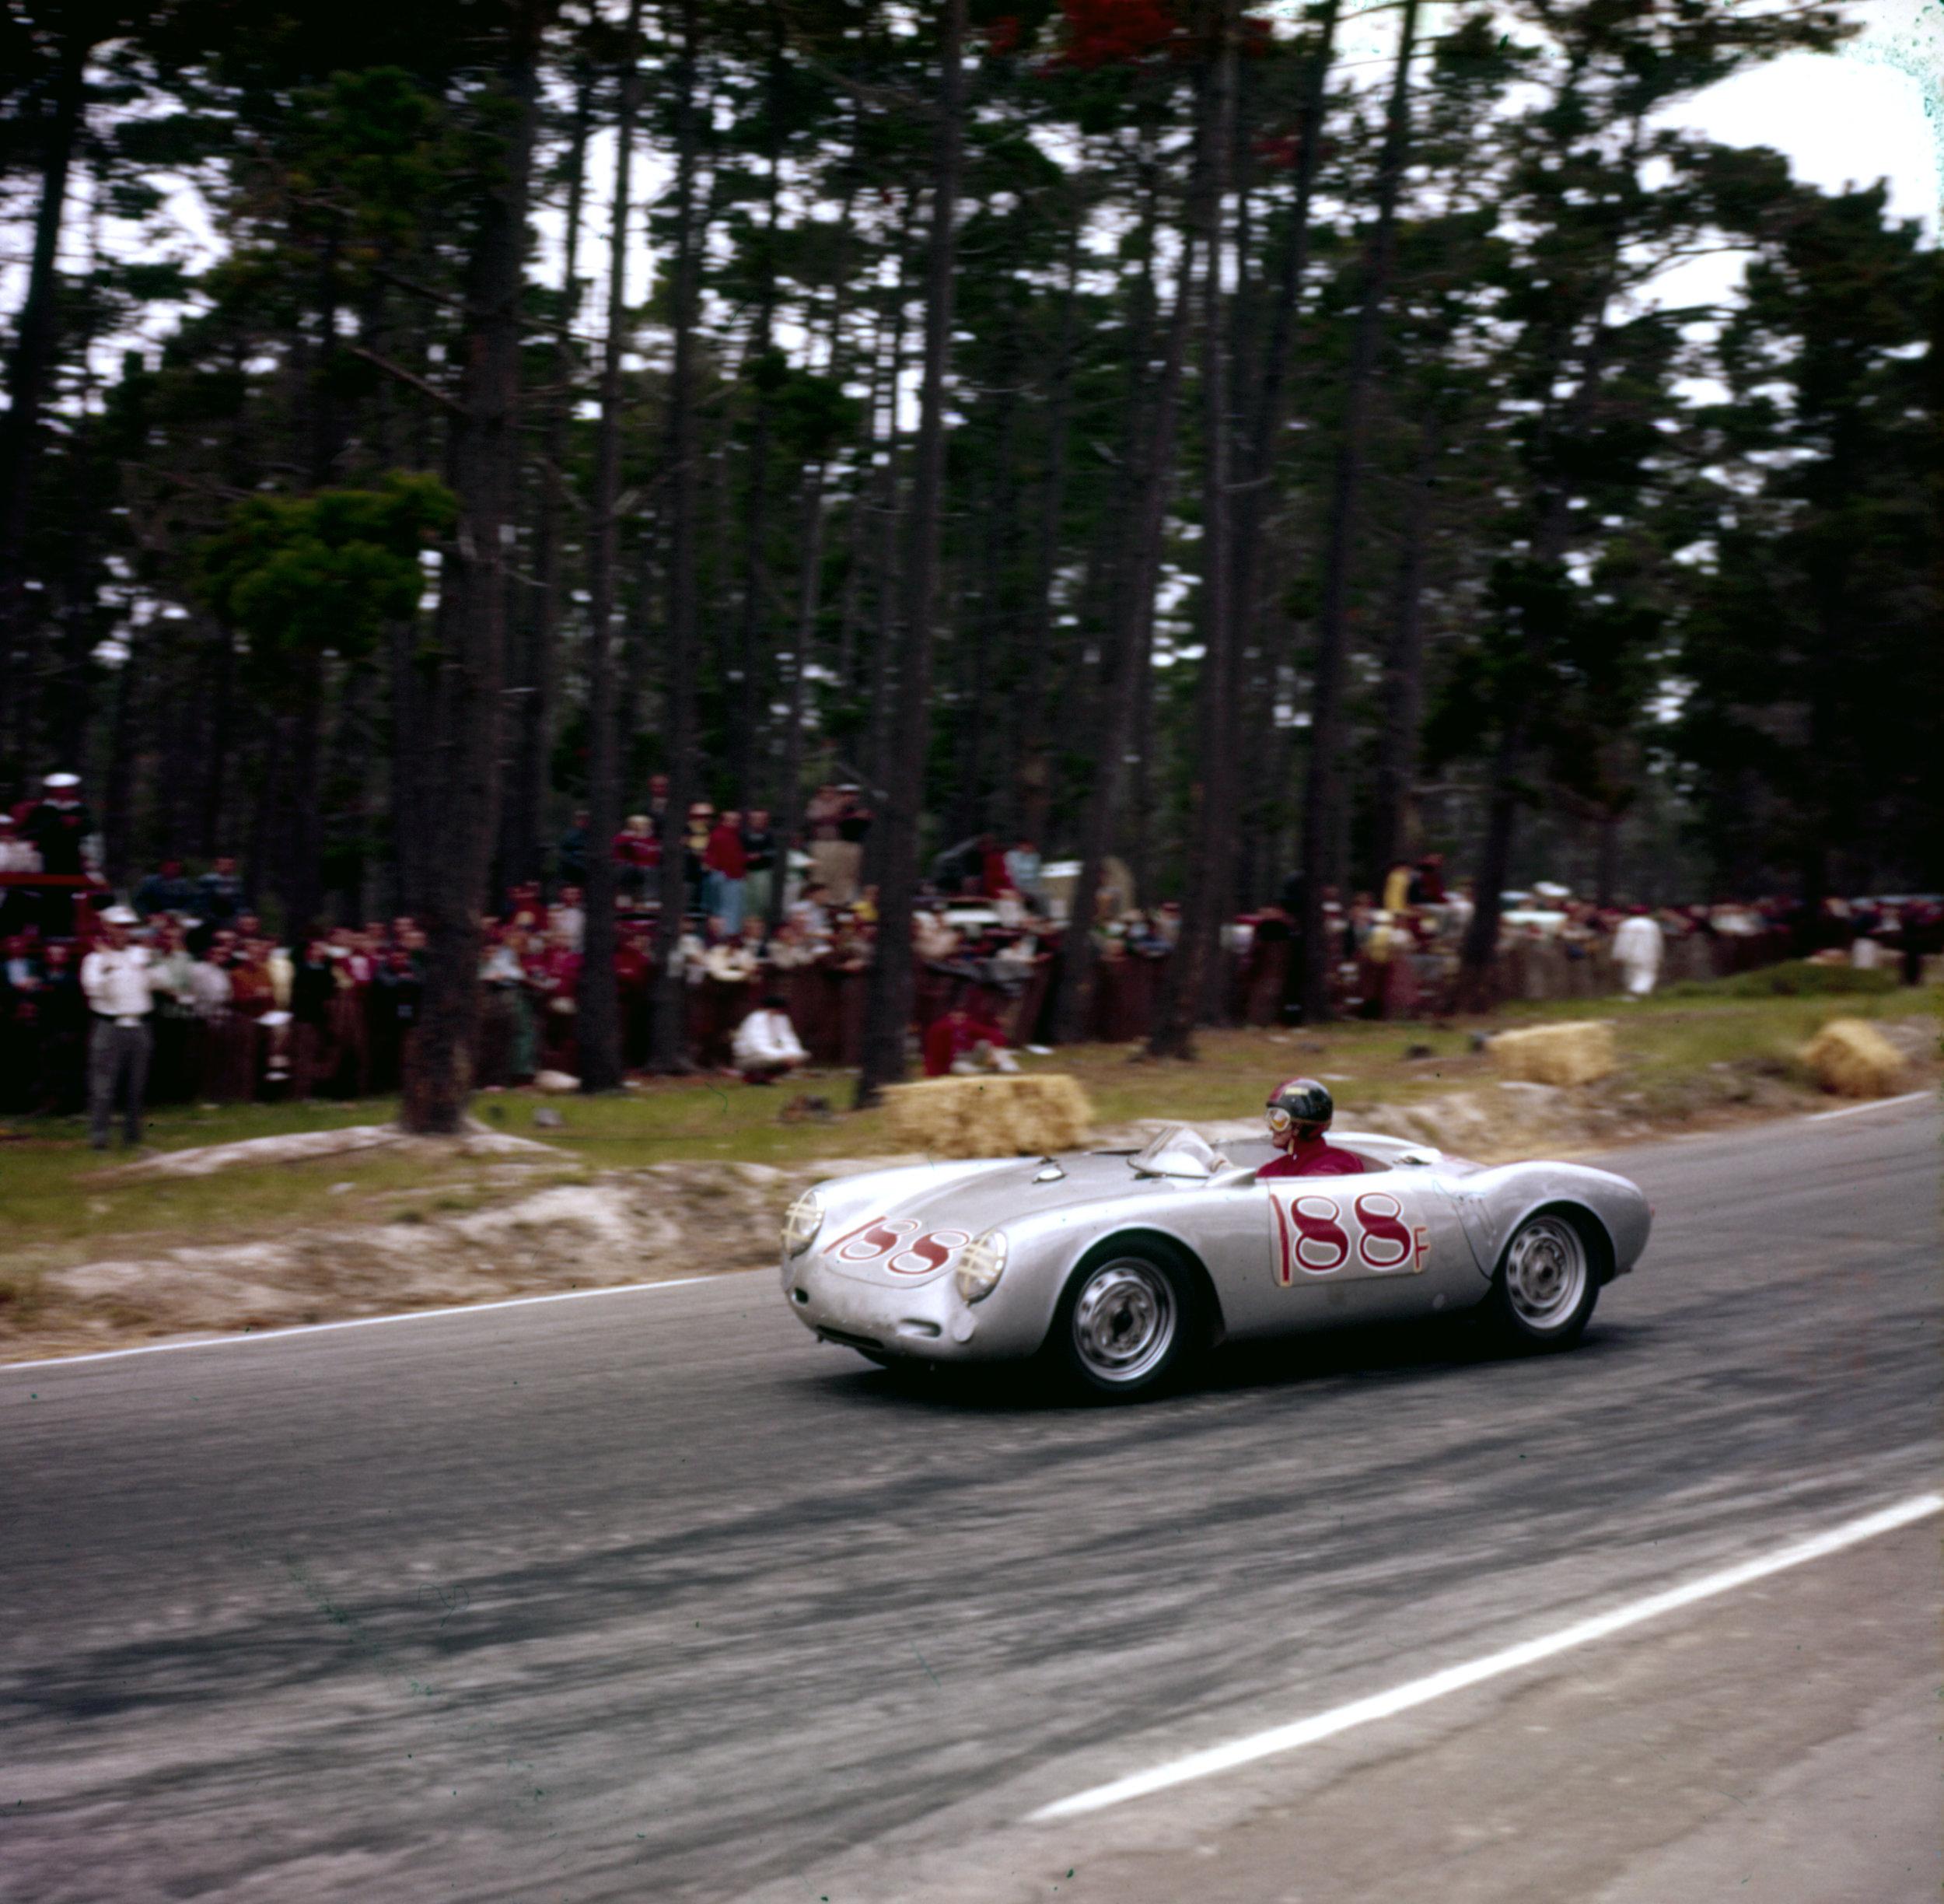 Jack McAfee in Porsche Spyder 550   Pebble Beach 1956, Jack McAfee winning the under 2-liter class in one of John Edgar's three Porsche 550 spyders.